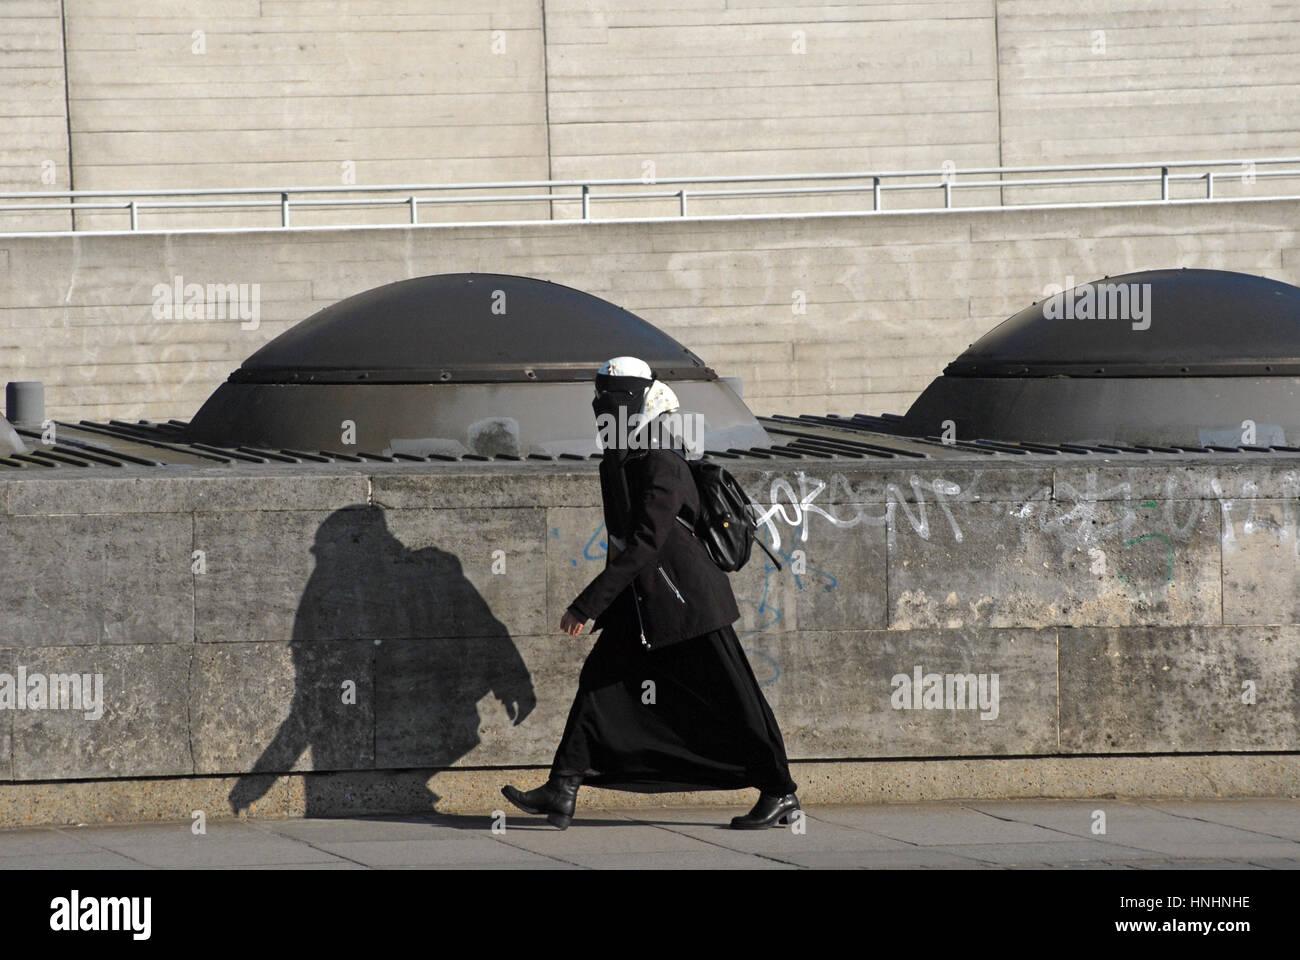 Niqab London Stock Photos & Niqab London Stock Images - Alamy